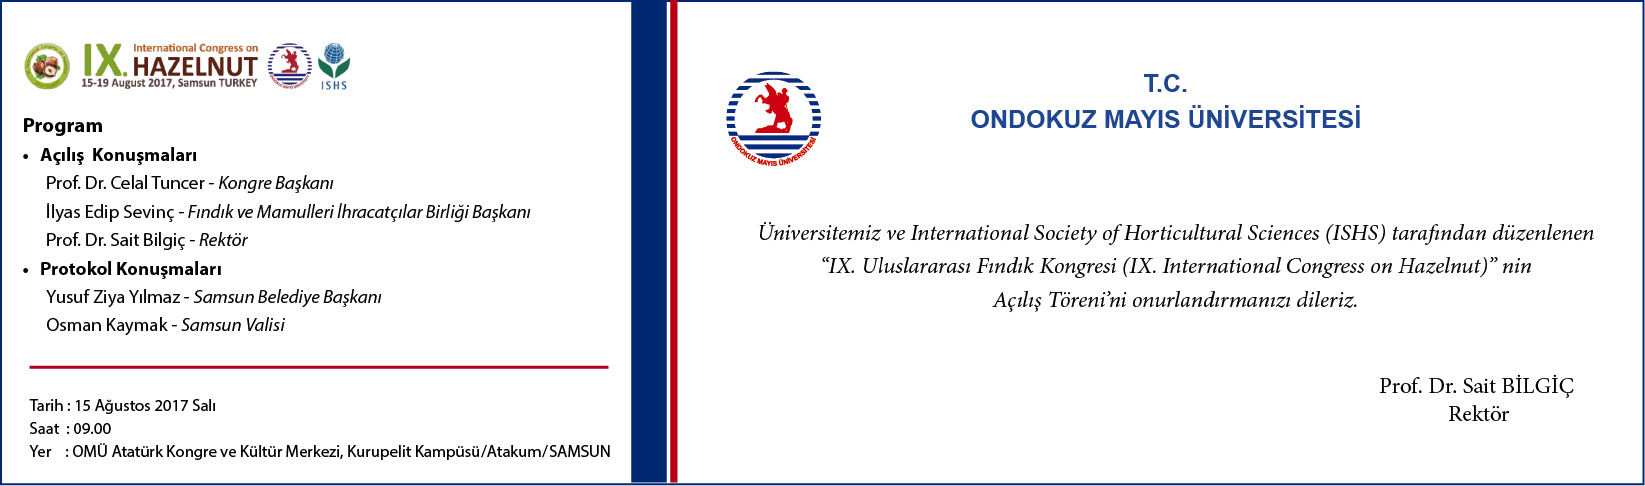 http://www.omu.edu.tr/sites/default/files/files/davet_-_ix._uluslararasi_findik_kongresi_/findikkongresi.jpg